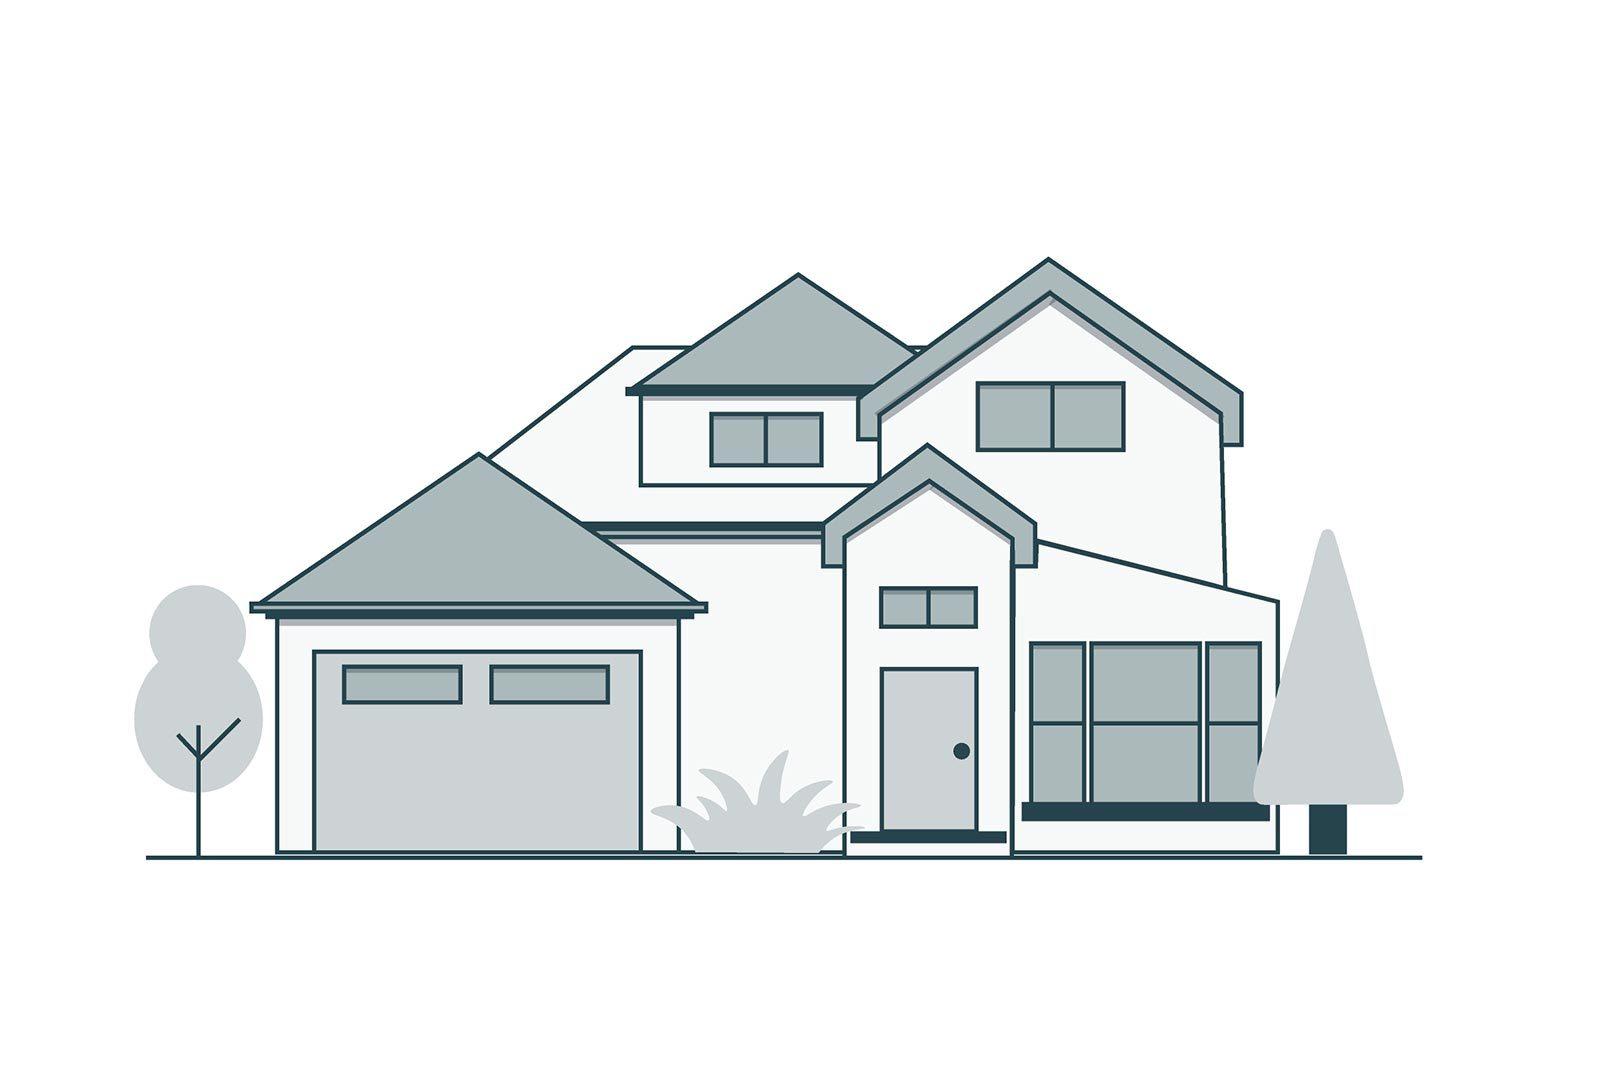 1319 S King Rd San Jose, CA 95122